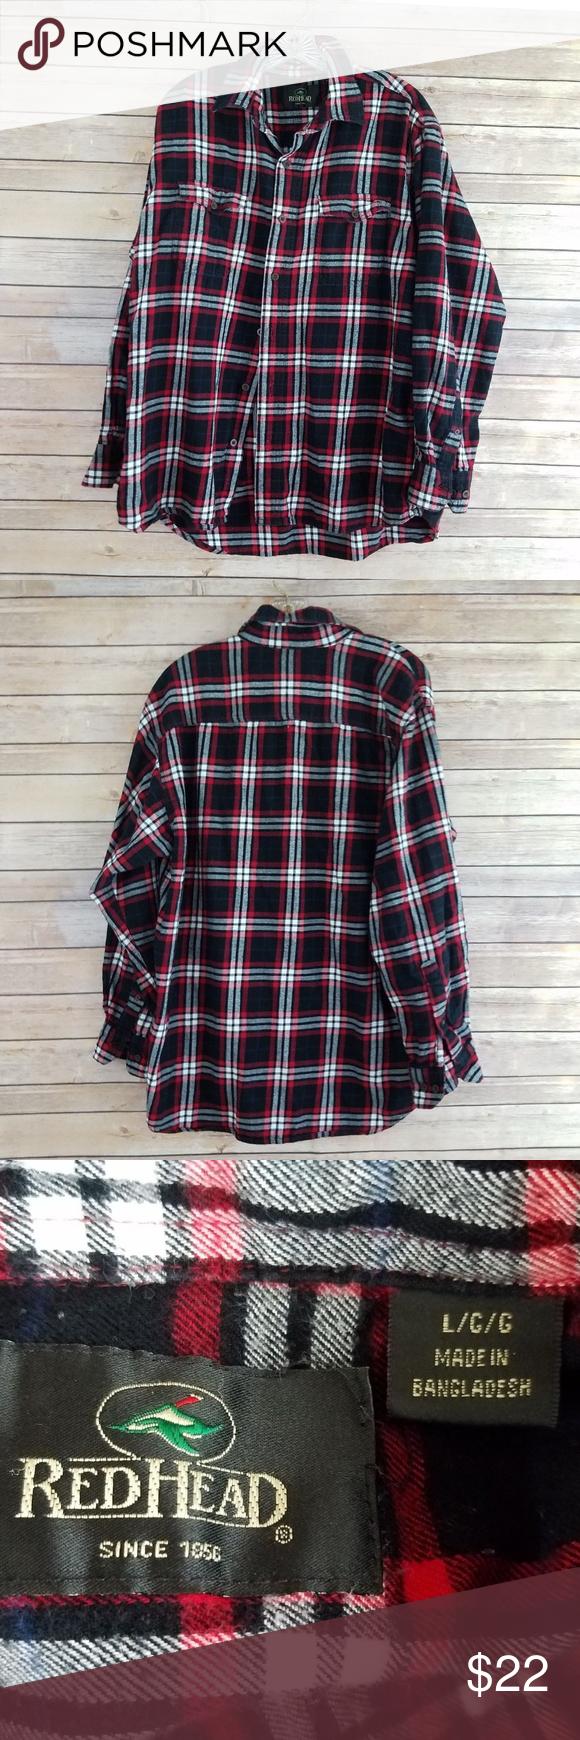 Flannel shirt black  Redhead Plaid Button Up Long Sleeve Flannel Shirt  My Posh Closet